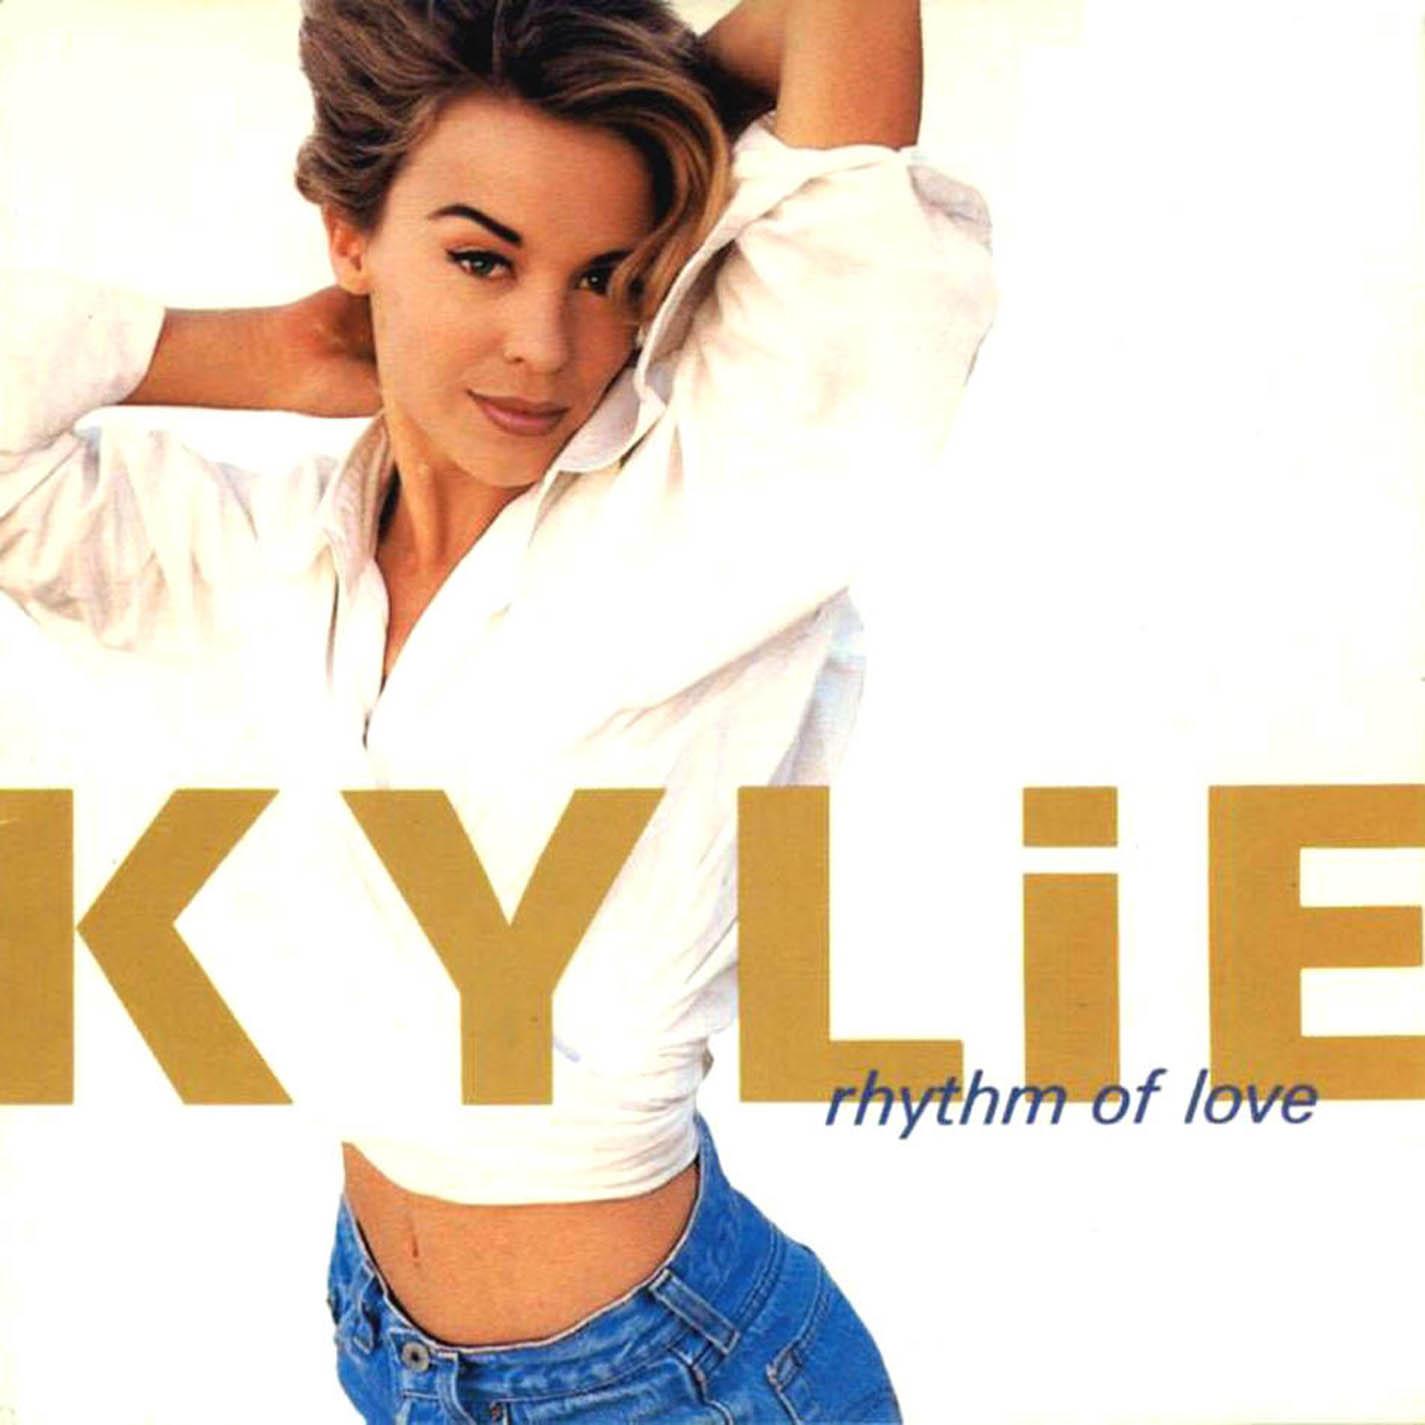 Kylie Minogue: Rhythm of Love